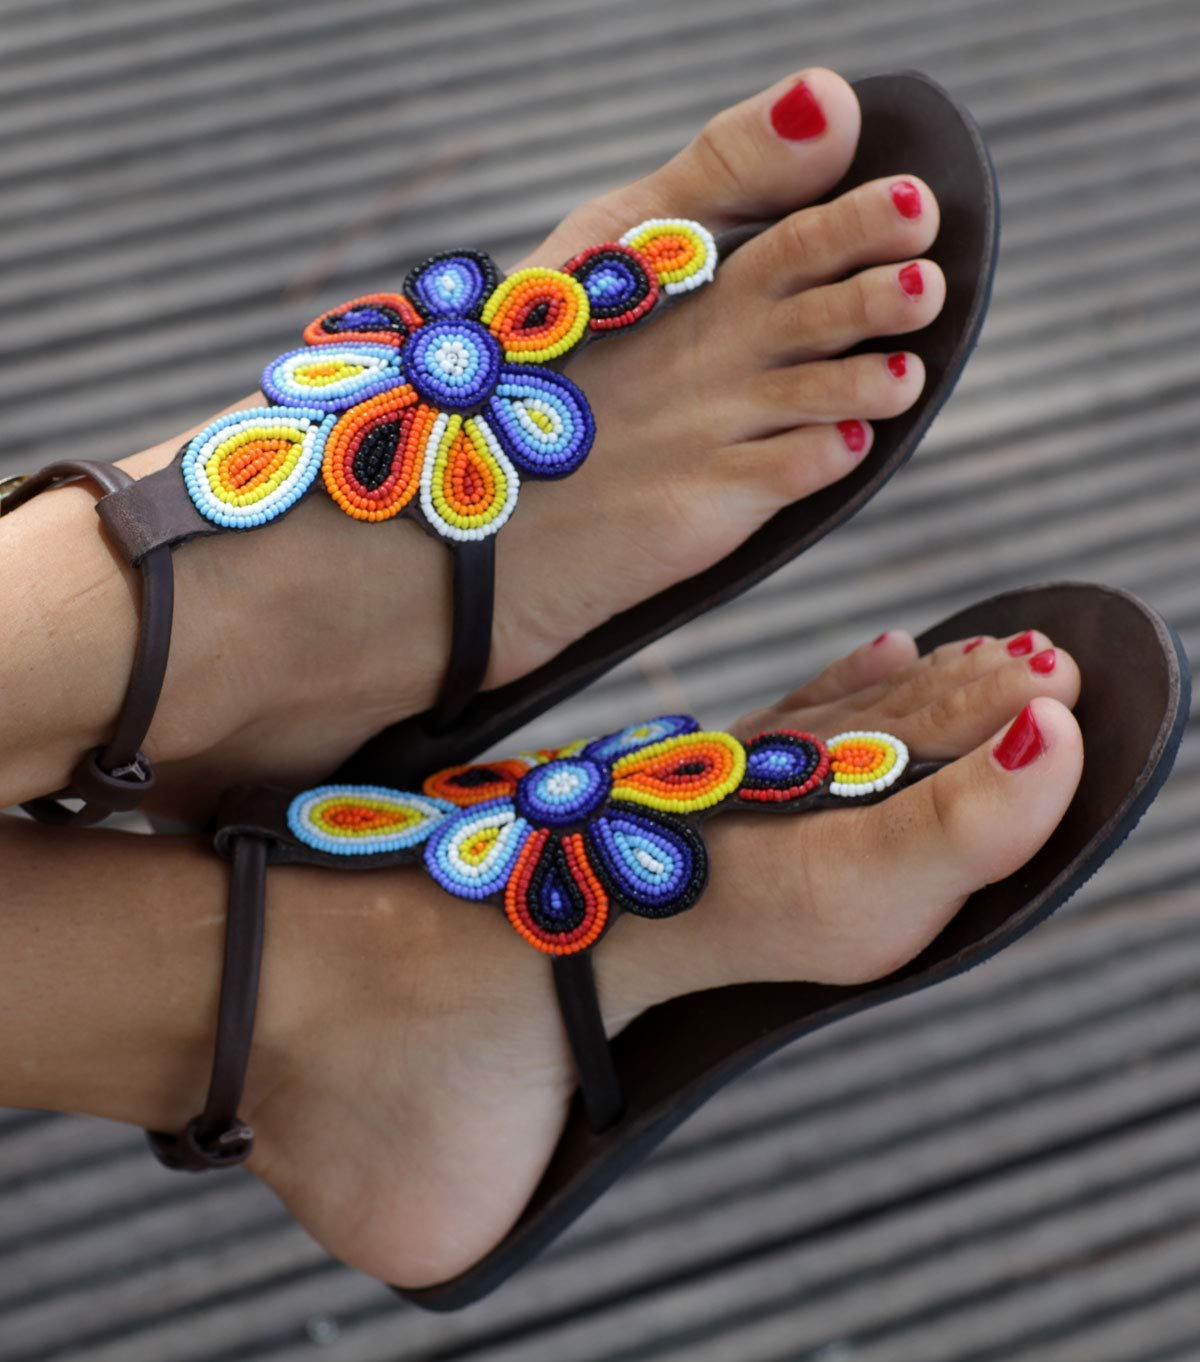 B07H5KGP38 GlobalHandmade Brown Leather Sandals Woman Greek Shoes Vintage Style Beaded-Floral-Flip Flops-Hippie-BOHO-Tribal-Shoes-Summer-Handmade Sandals-Floral sandals 71nazu-4abL